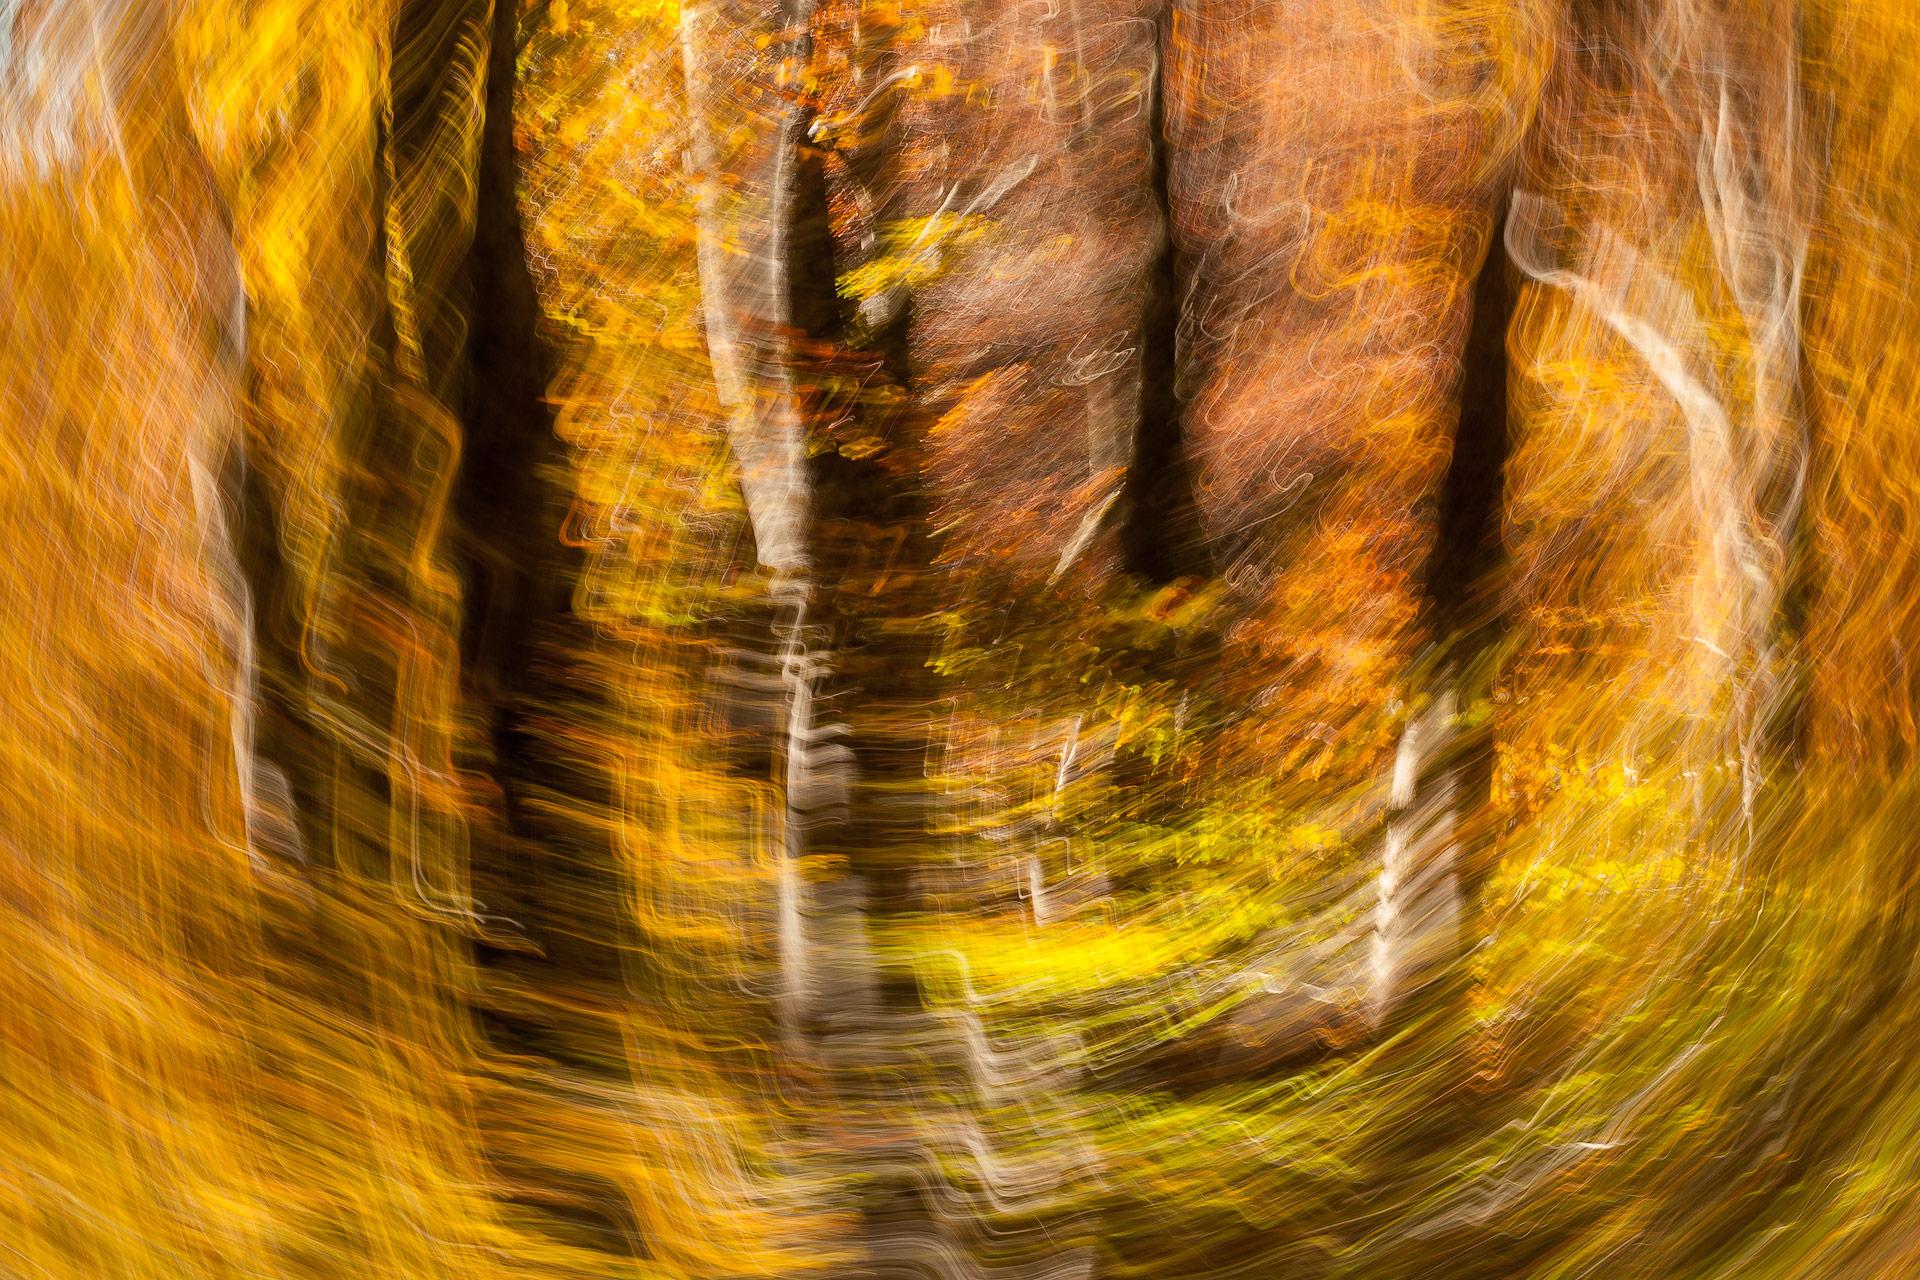 movimiento - Javier Alonso Torre Fotografia de naturaleza movimiento